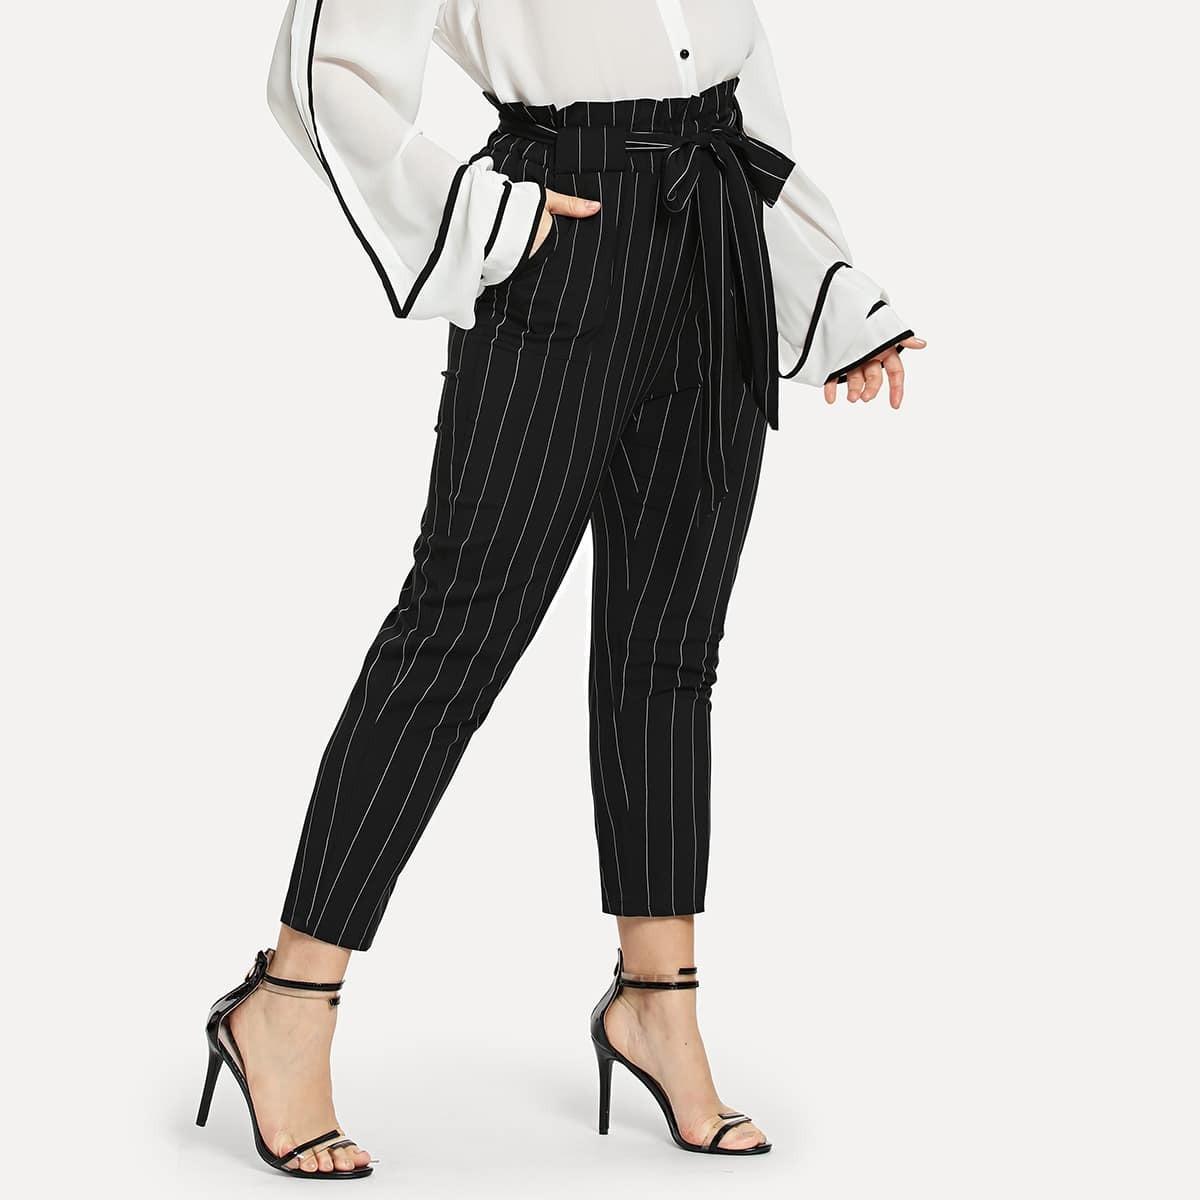 SHEIN coupon: Plus Striped Self Tie Waist Pants